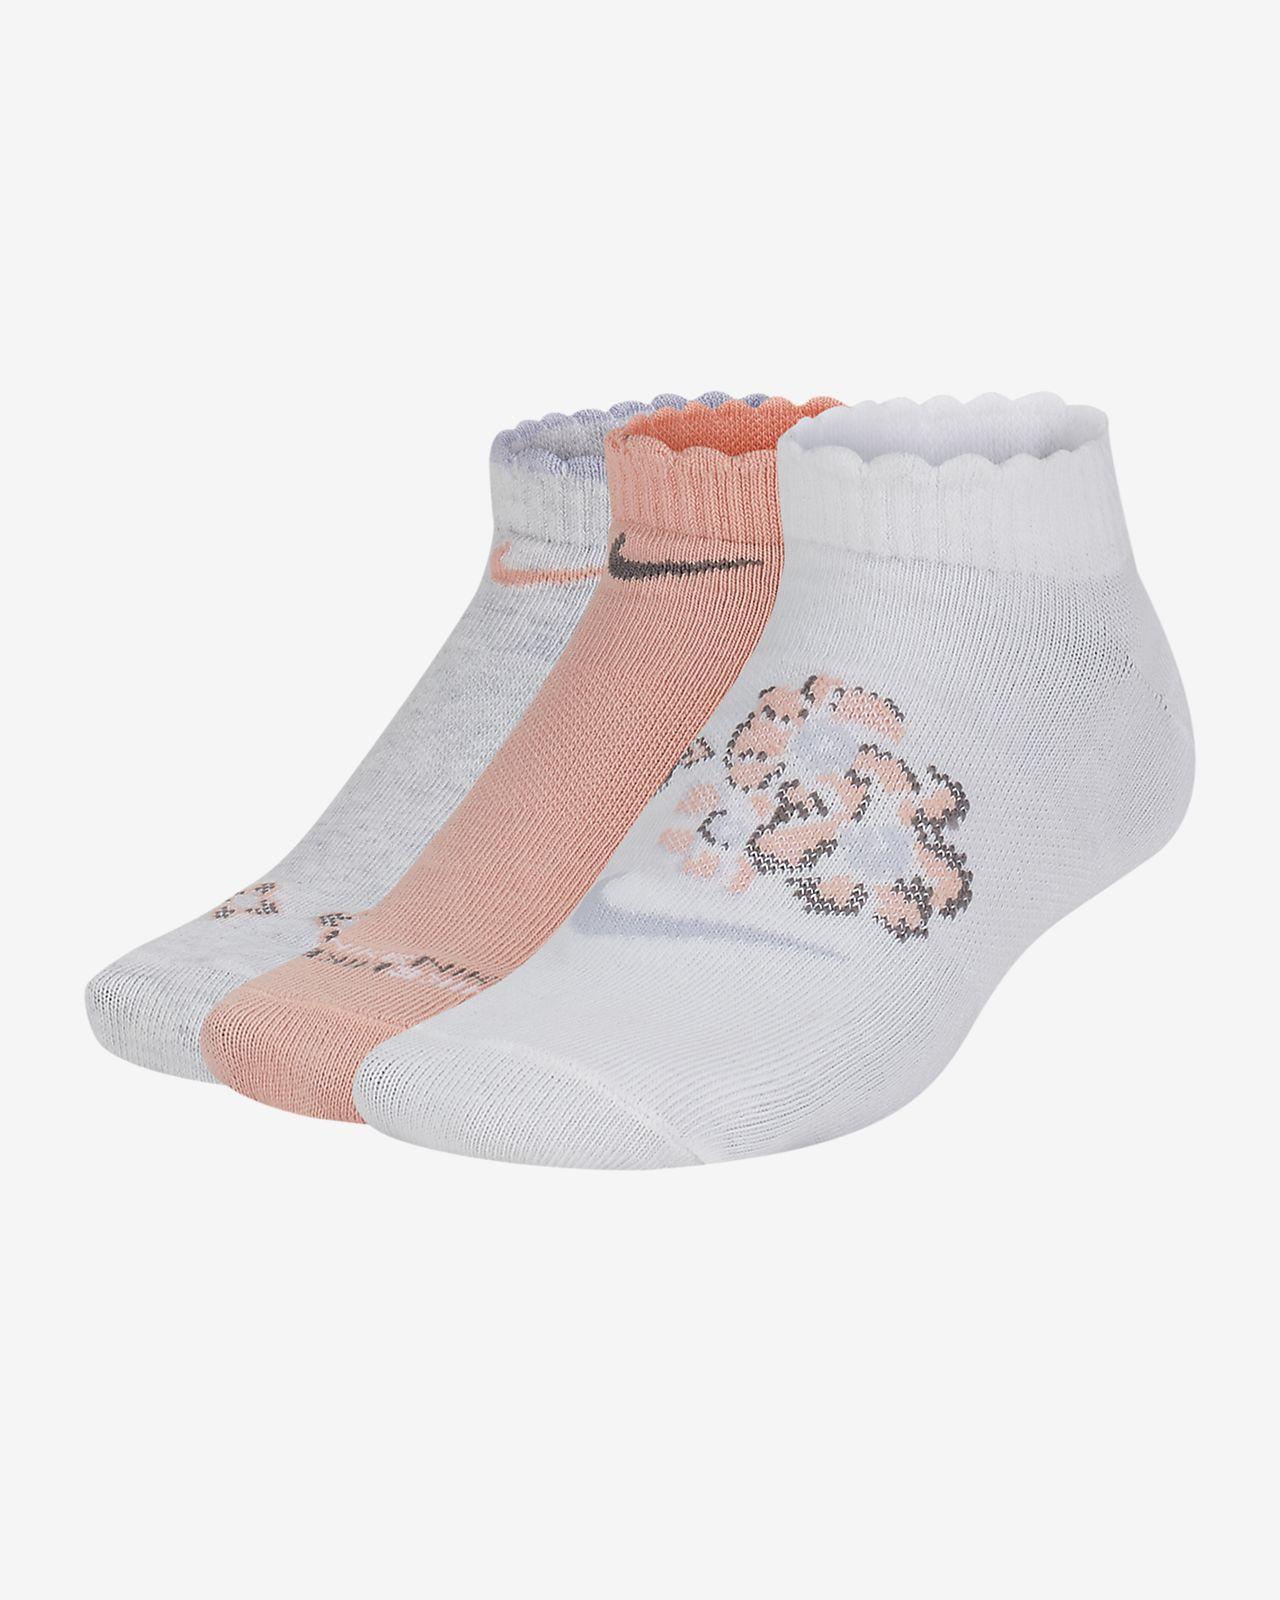 Nike Everyday Lightweight Kids' No-Show Graphic Socks (3 Pairs)